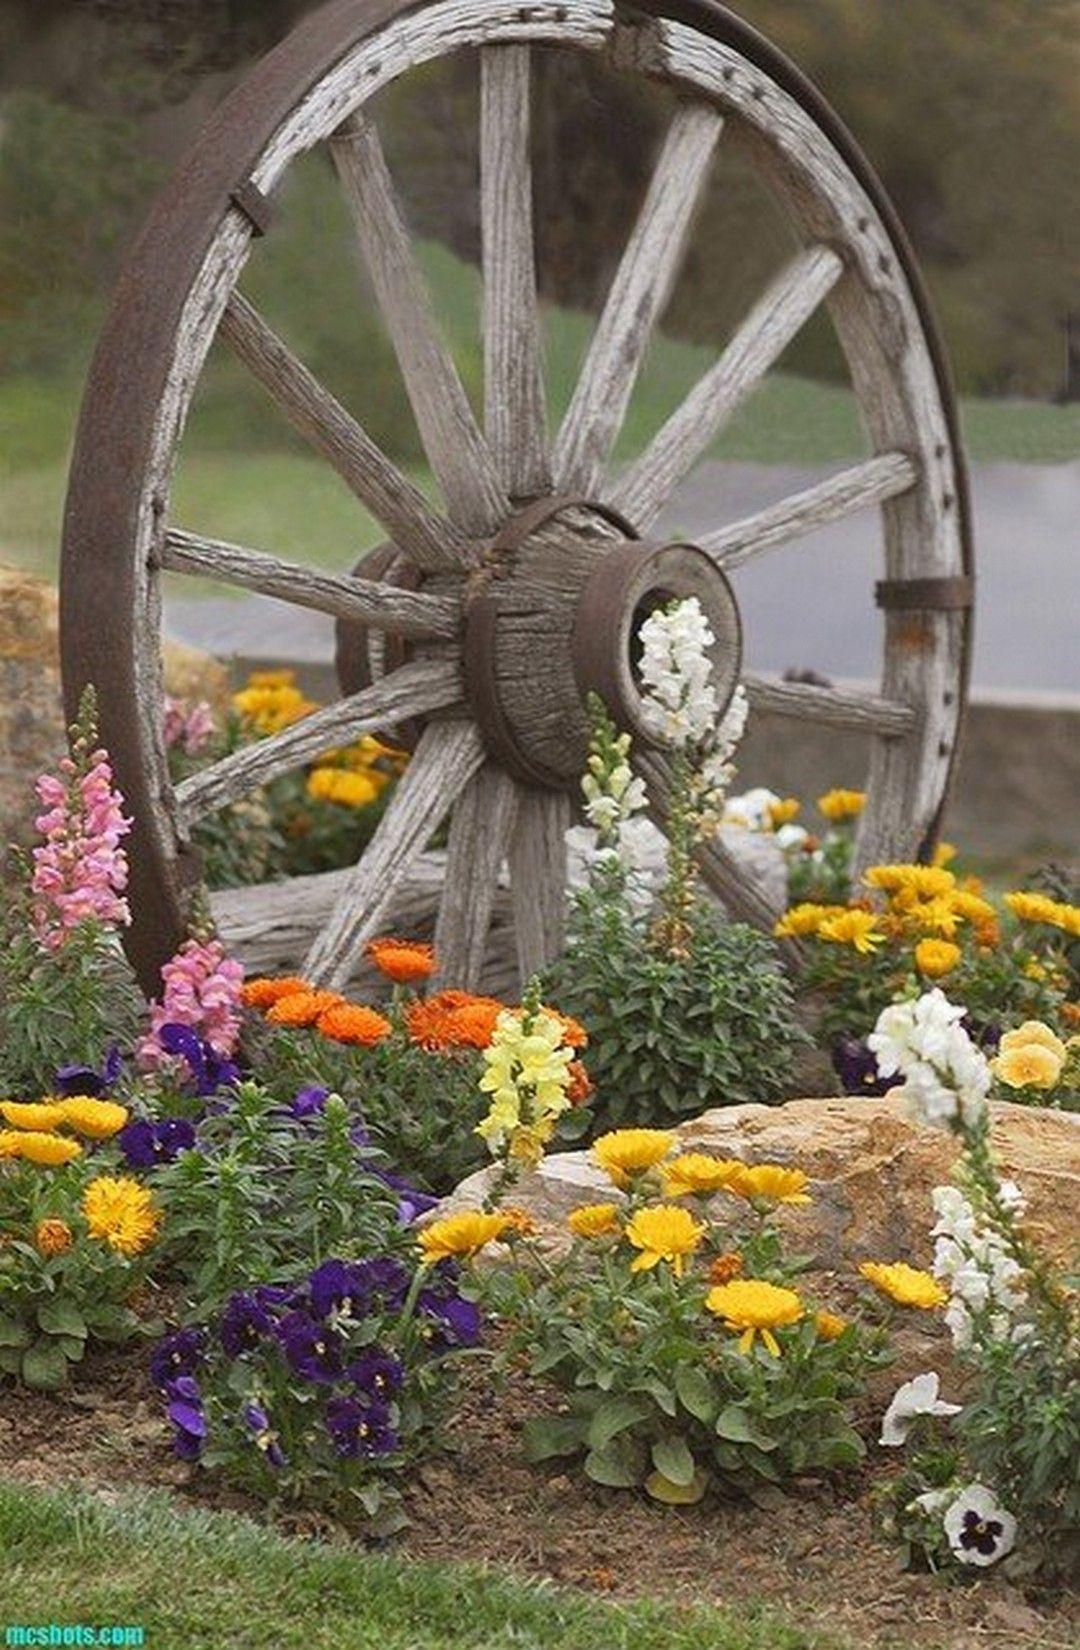 Farmhouse Landscaping Front Yard Ideas 20 Gorgeous Photos https